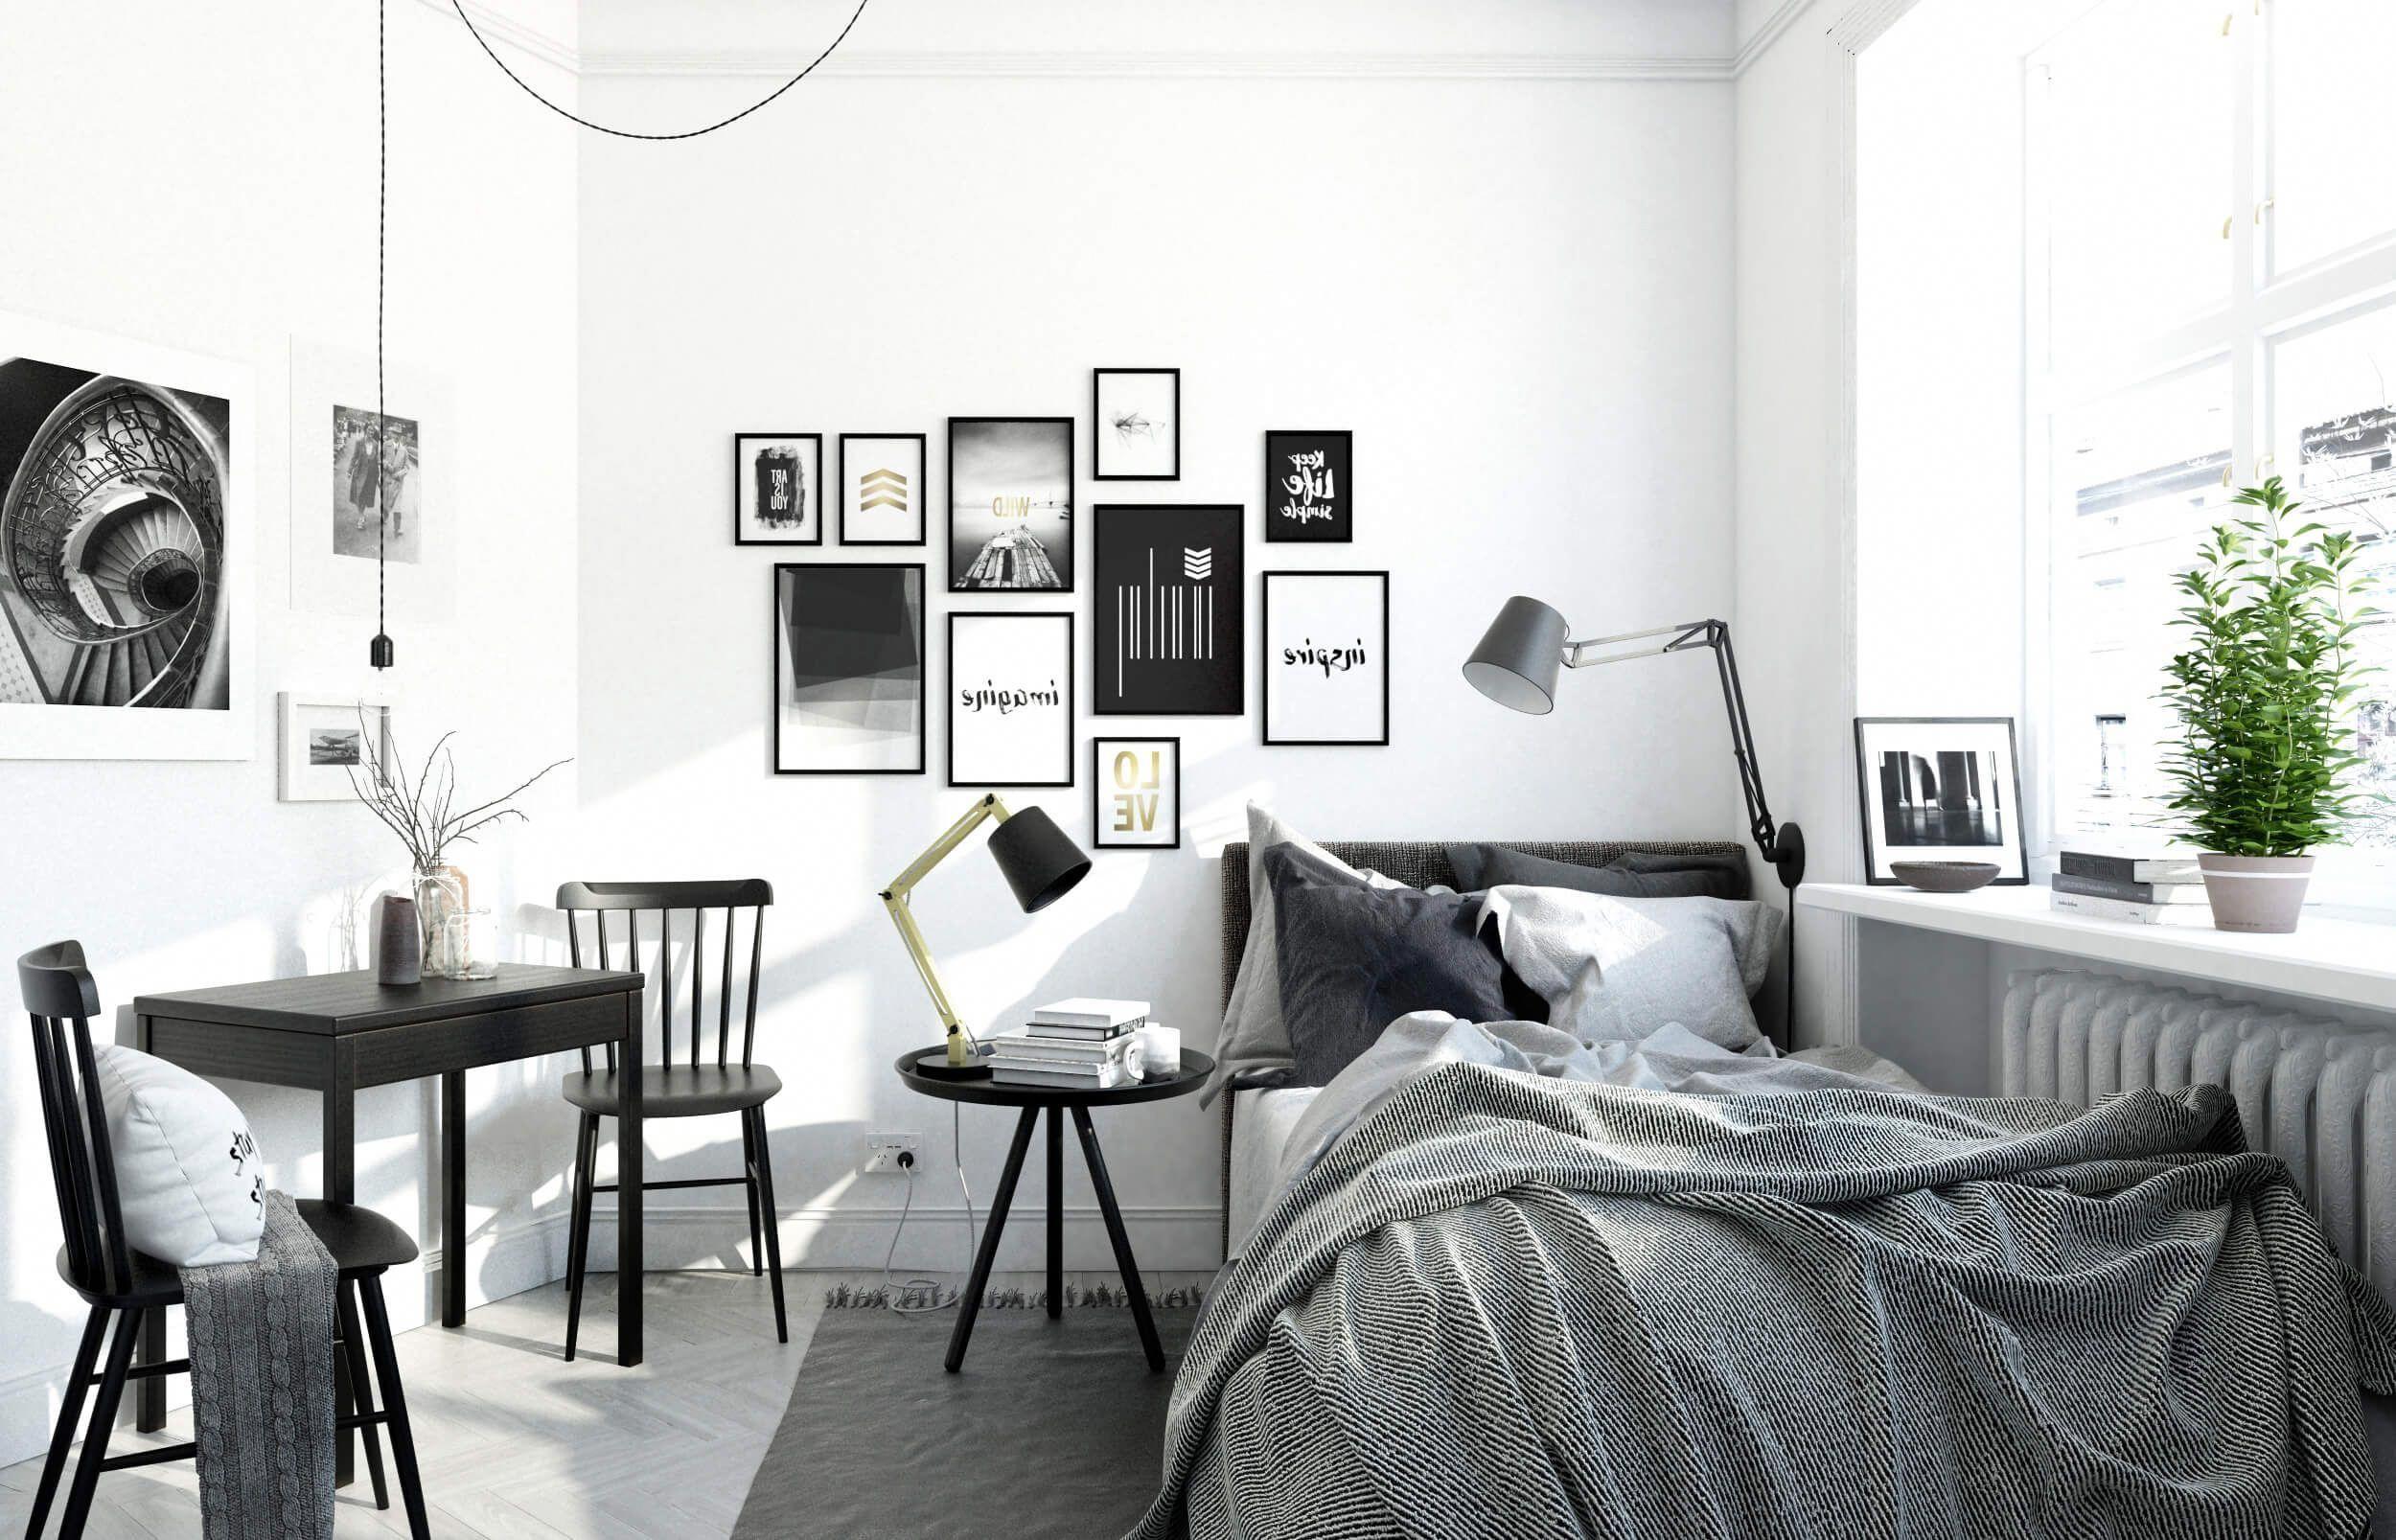 Small Black And White Scandinavian Bedroom 3d Interior Render By Nonagon Studio Smallbedr Scandinavian Style Bedroom Scandi Bedroom Small Apartment Bedrooms